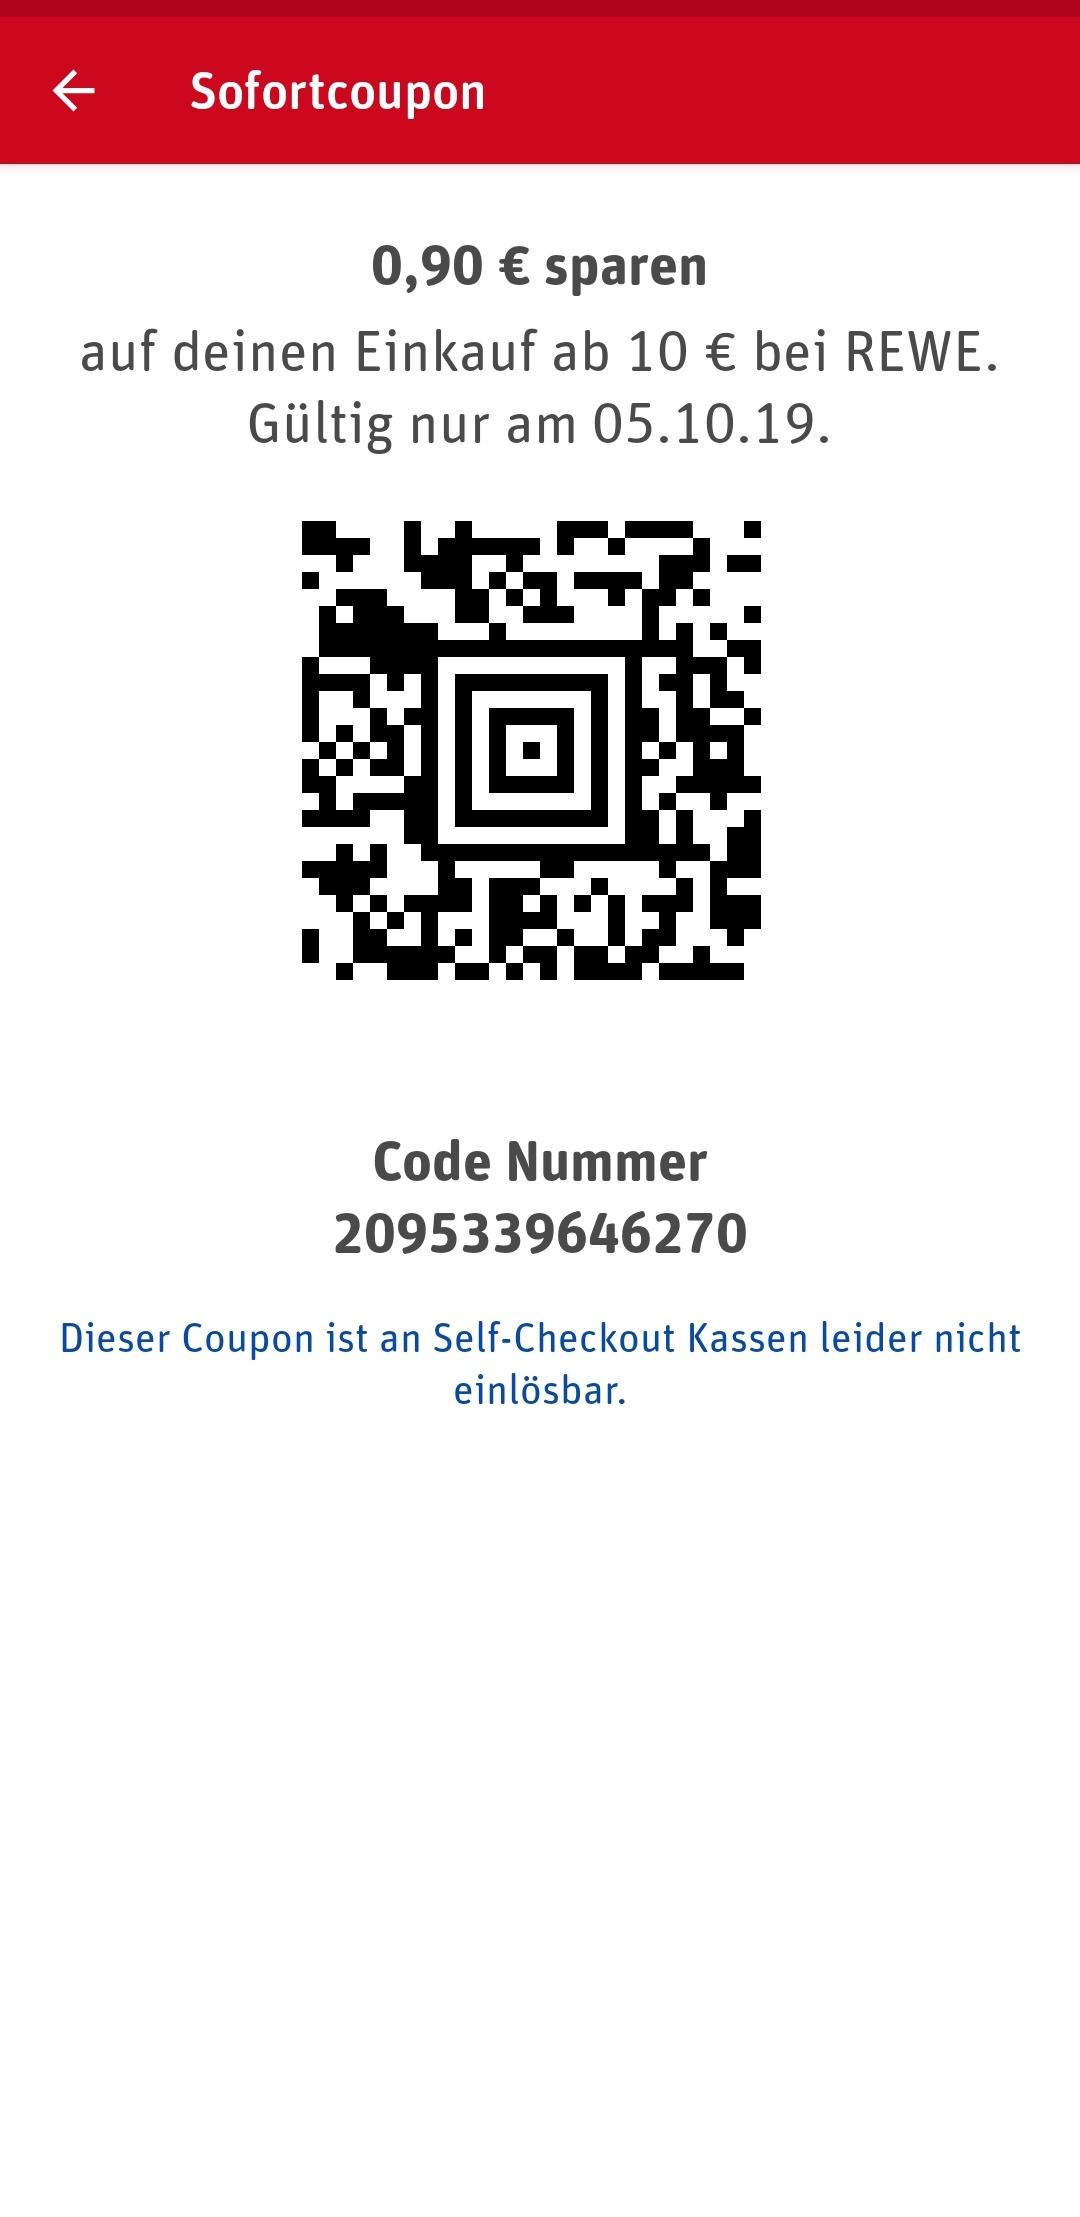 23005487-JwyRV.jpg